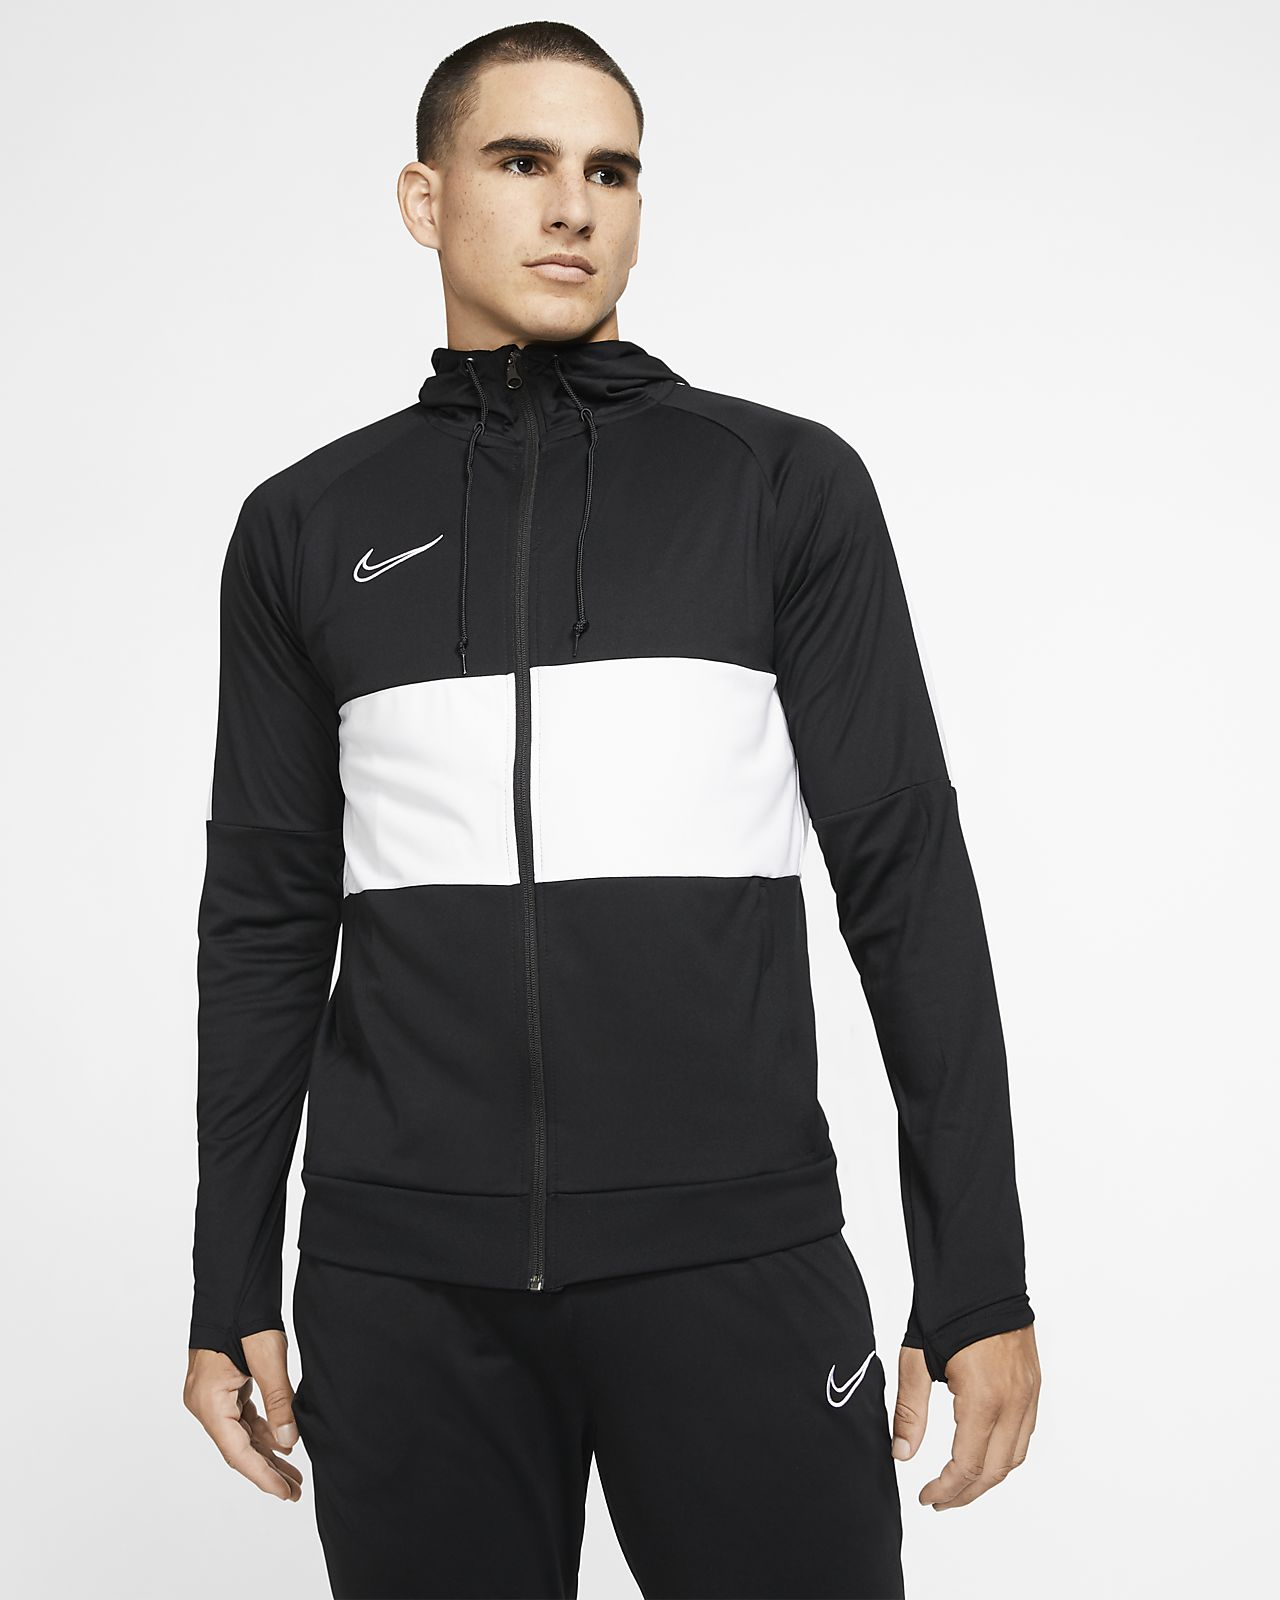 Nike Dri-FIT Academy Chaqueta de fútbol - Hombre